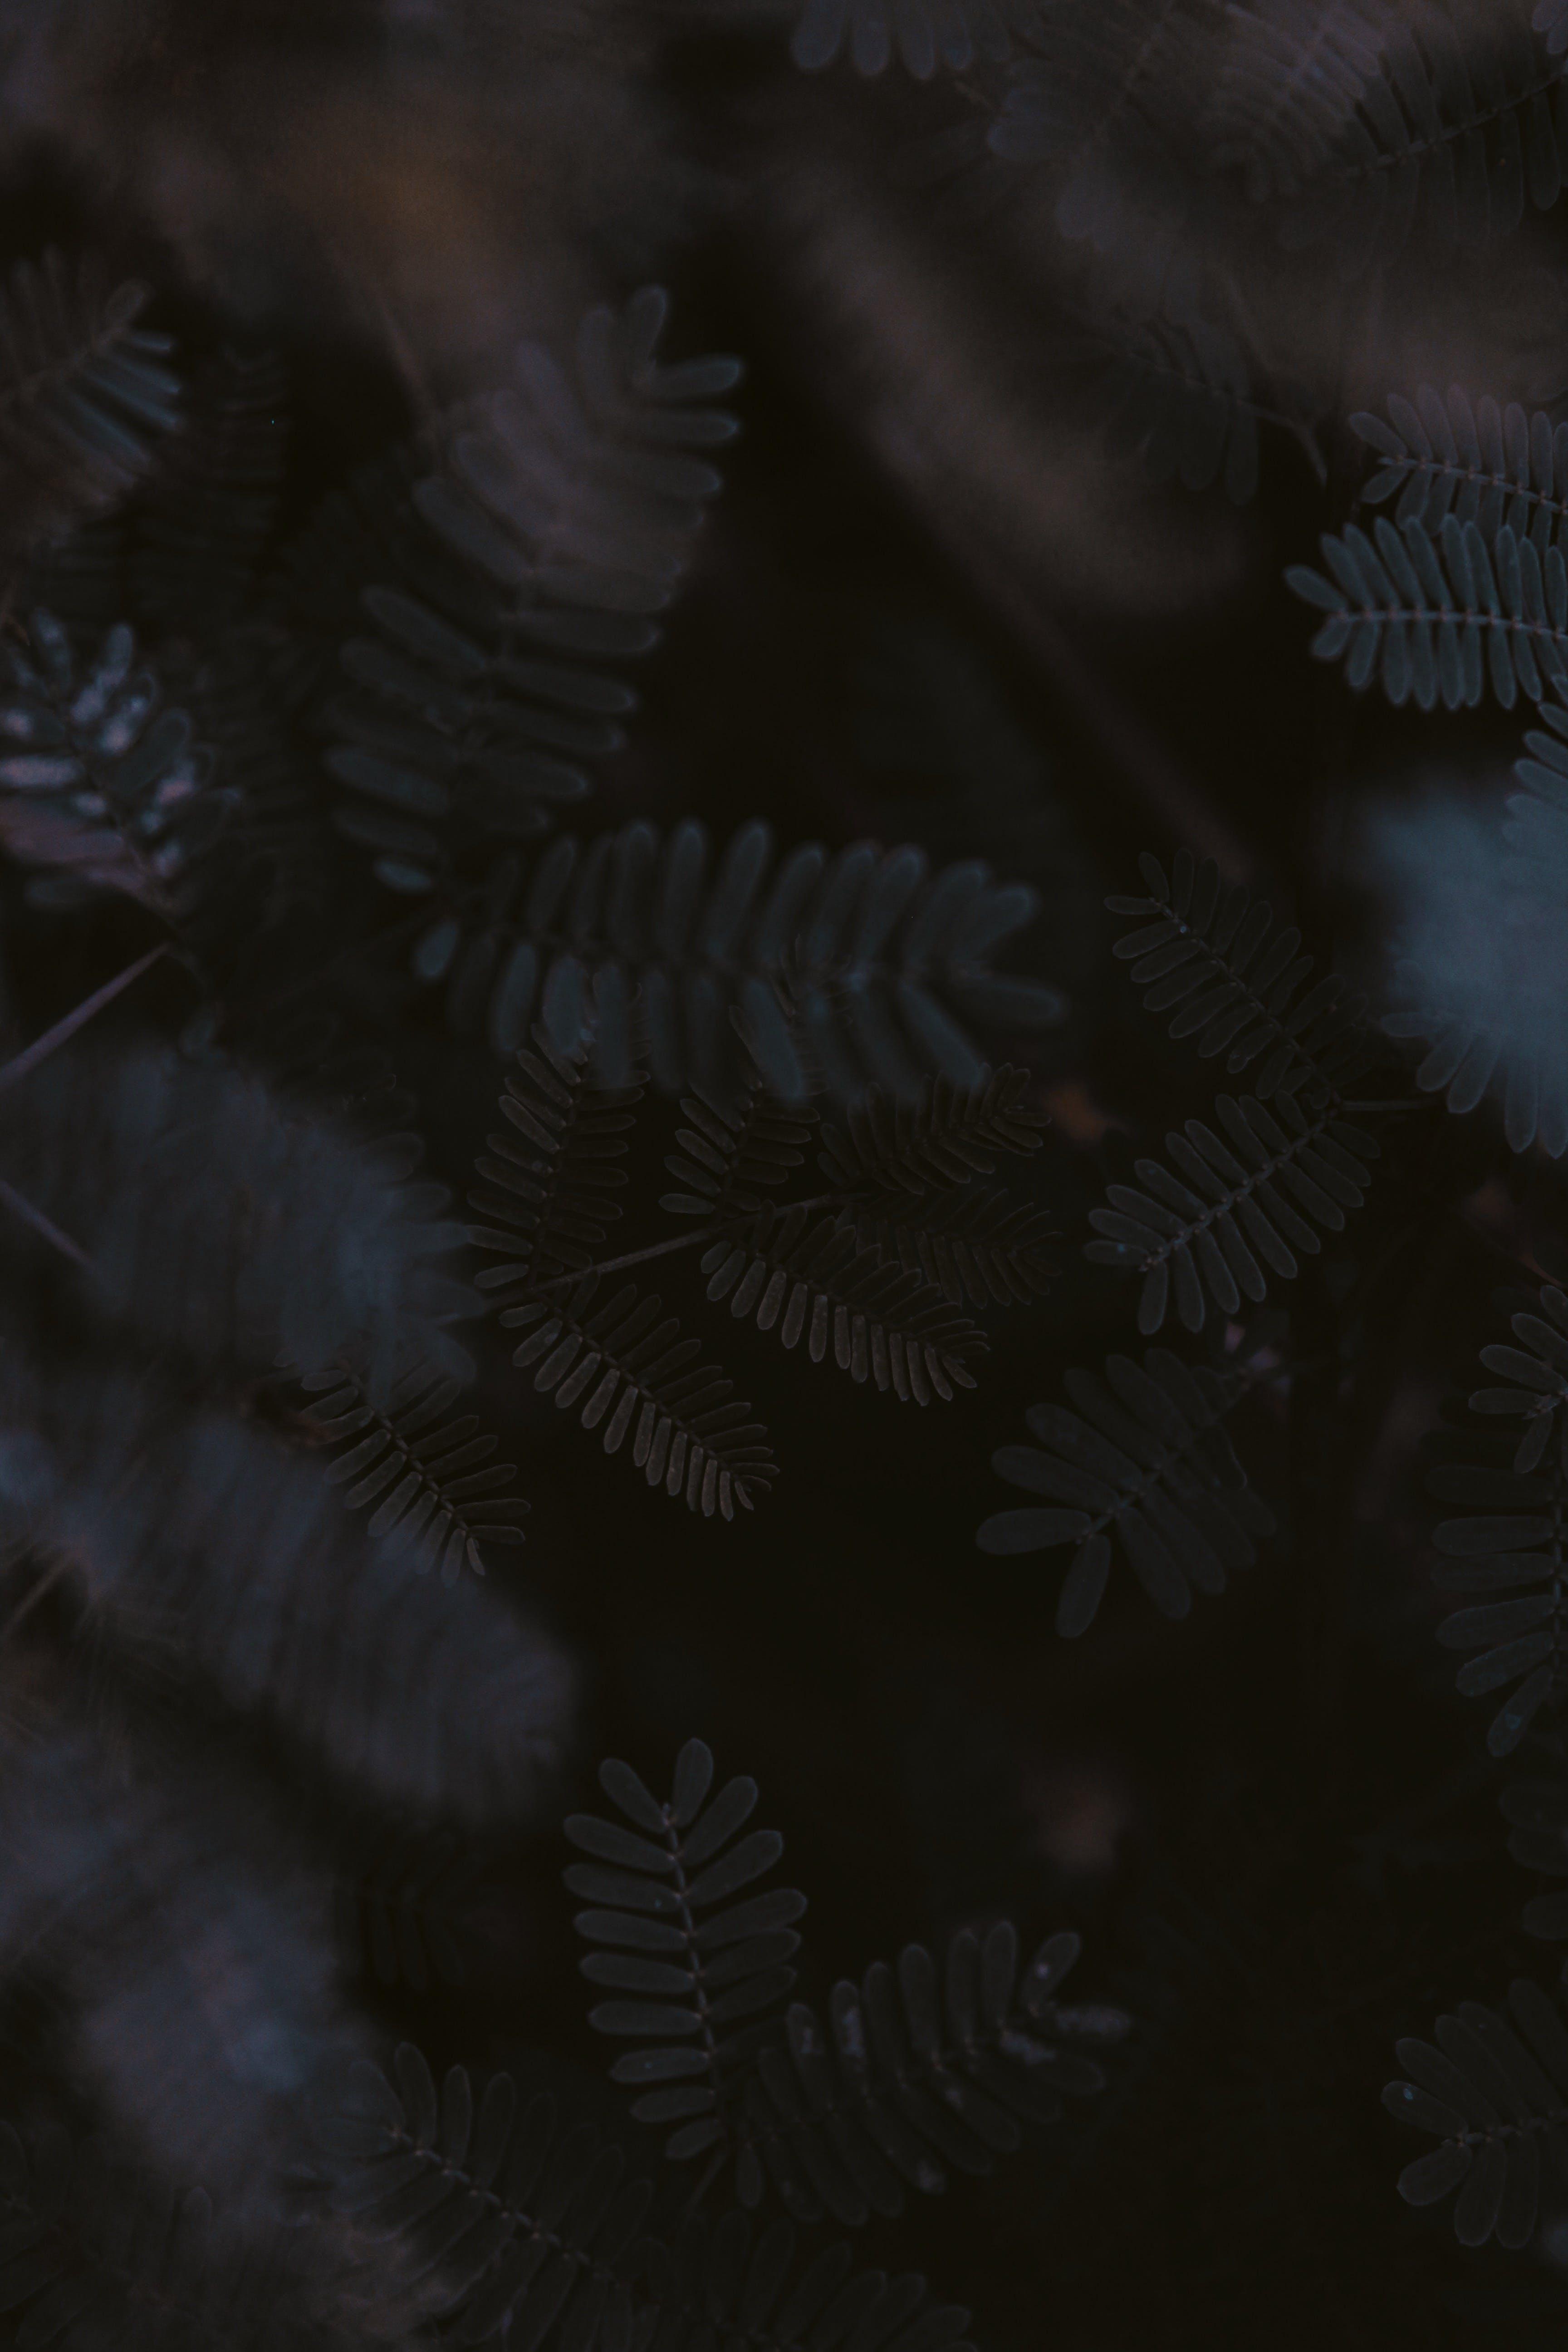 Black and White Fern Leaves